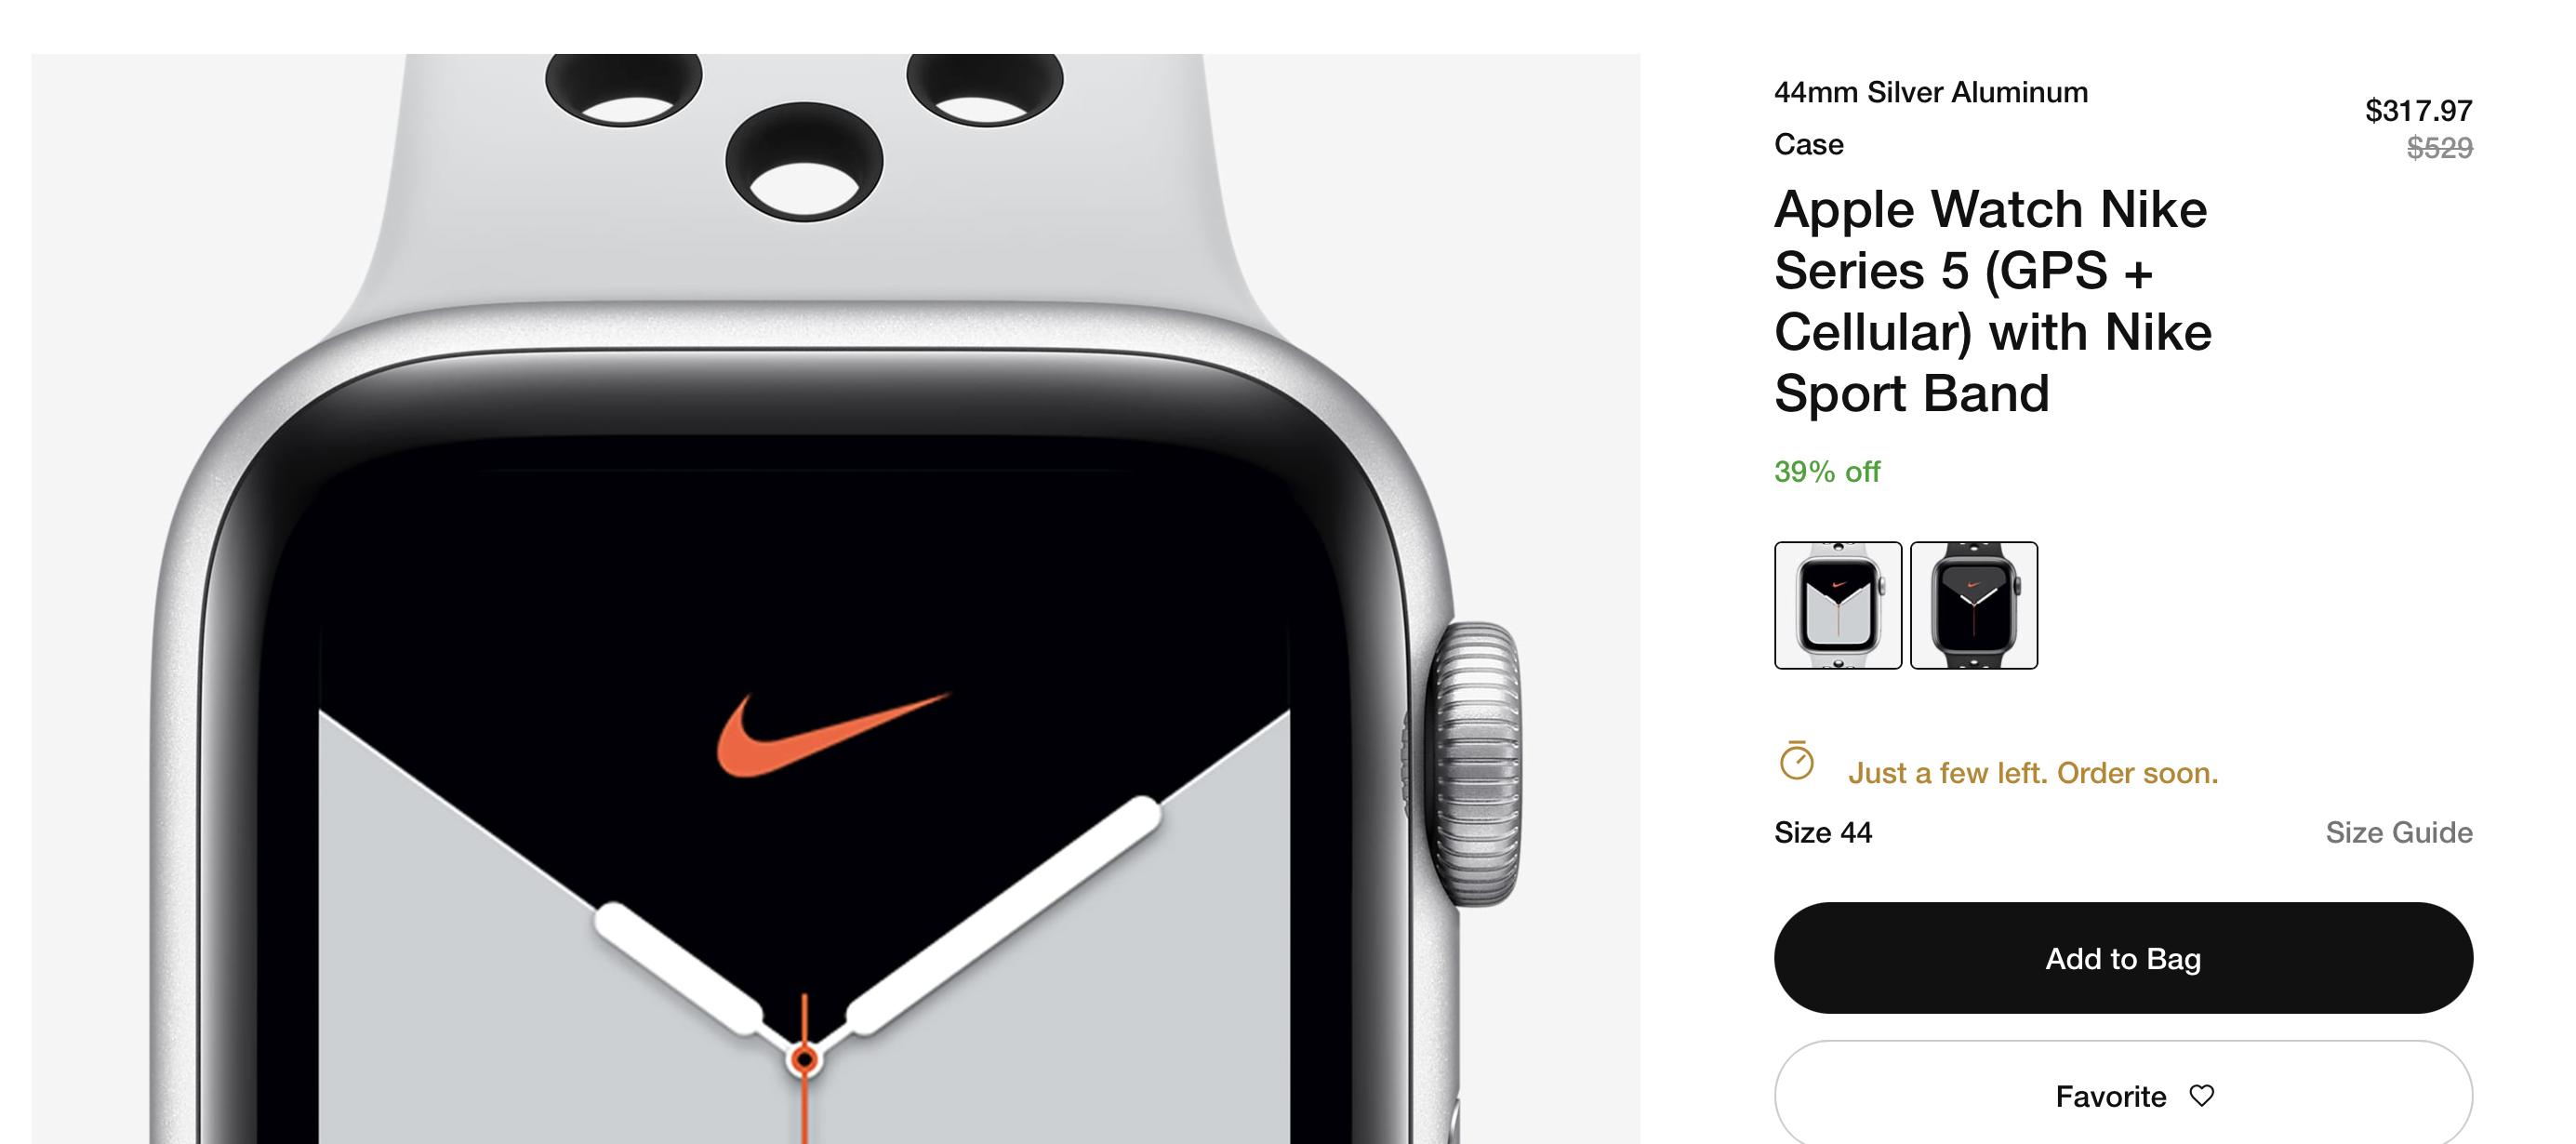 Apple Watch Nike 5 44mm Silver Aluminum (GPS + Cellular) 317.97 $317.97